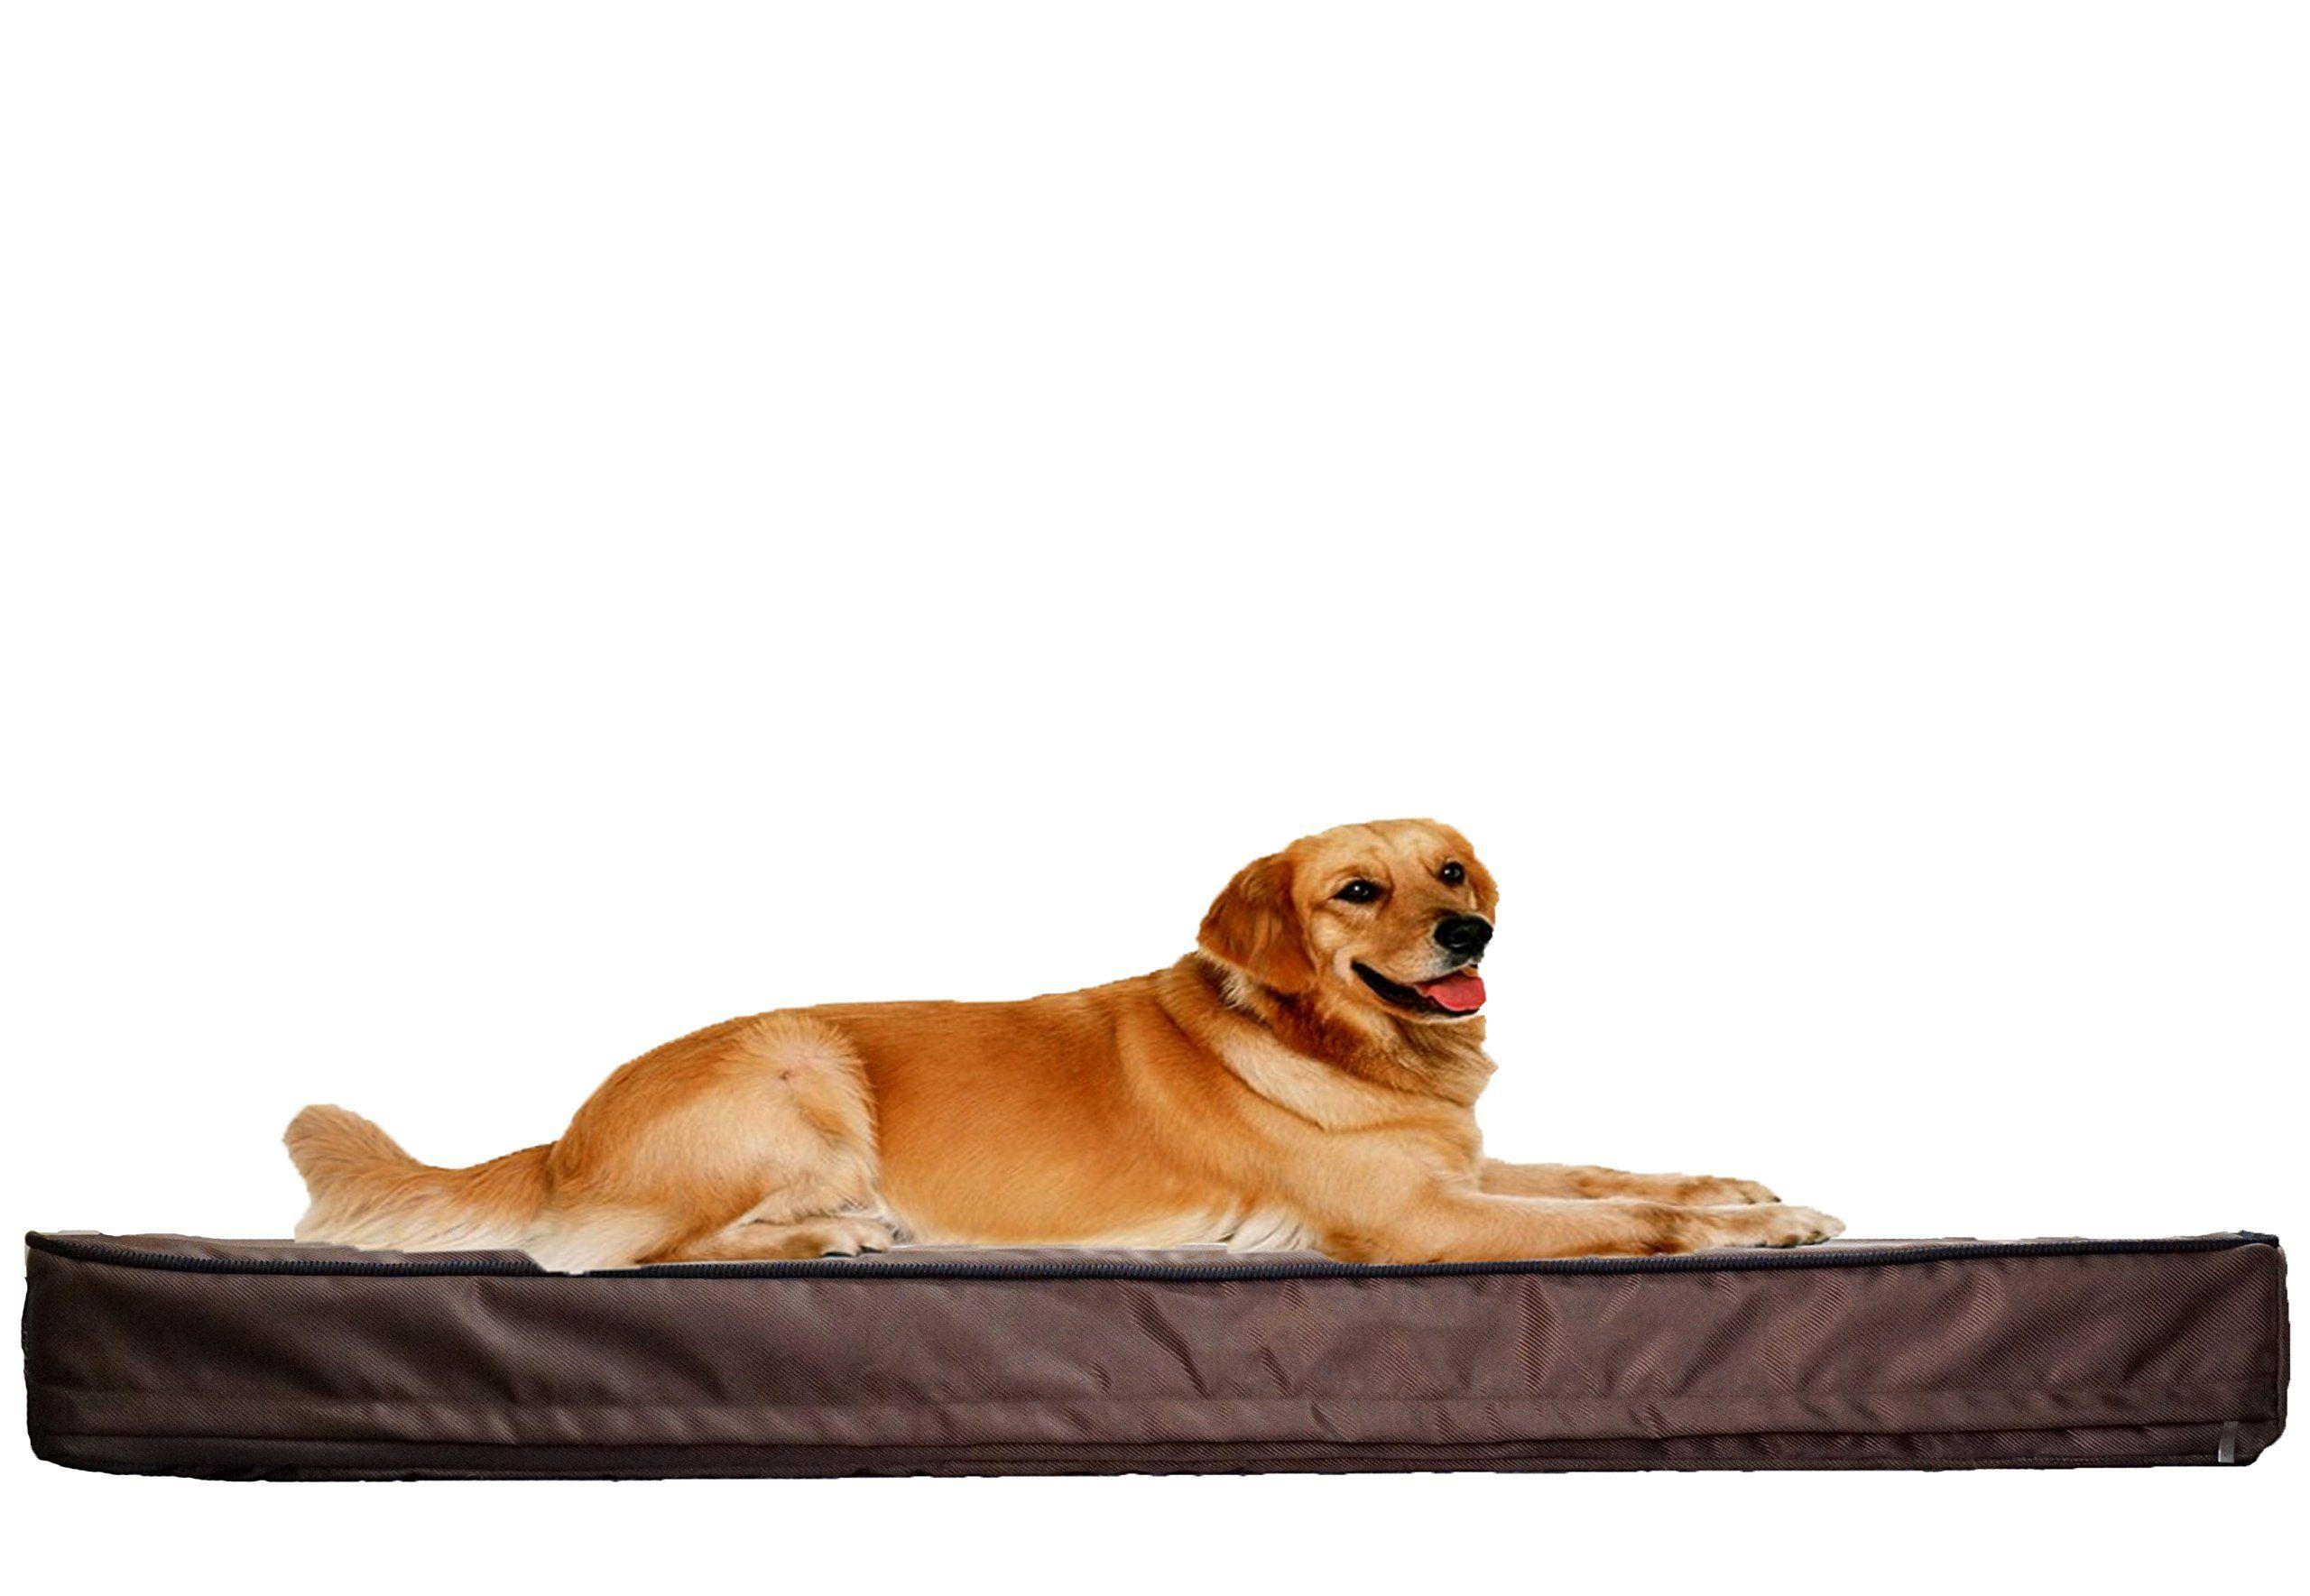 PetBed4Less Deluxe Orthopedic Memory Foam Dog Bed Pet Pad